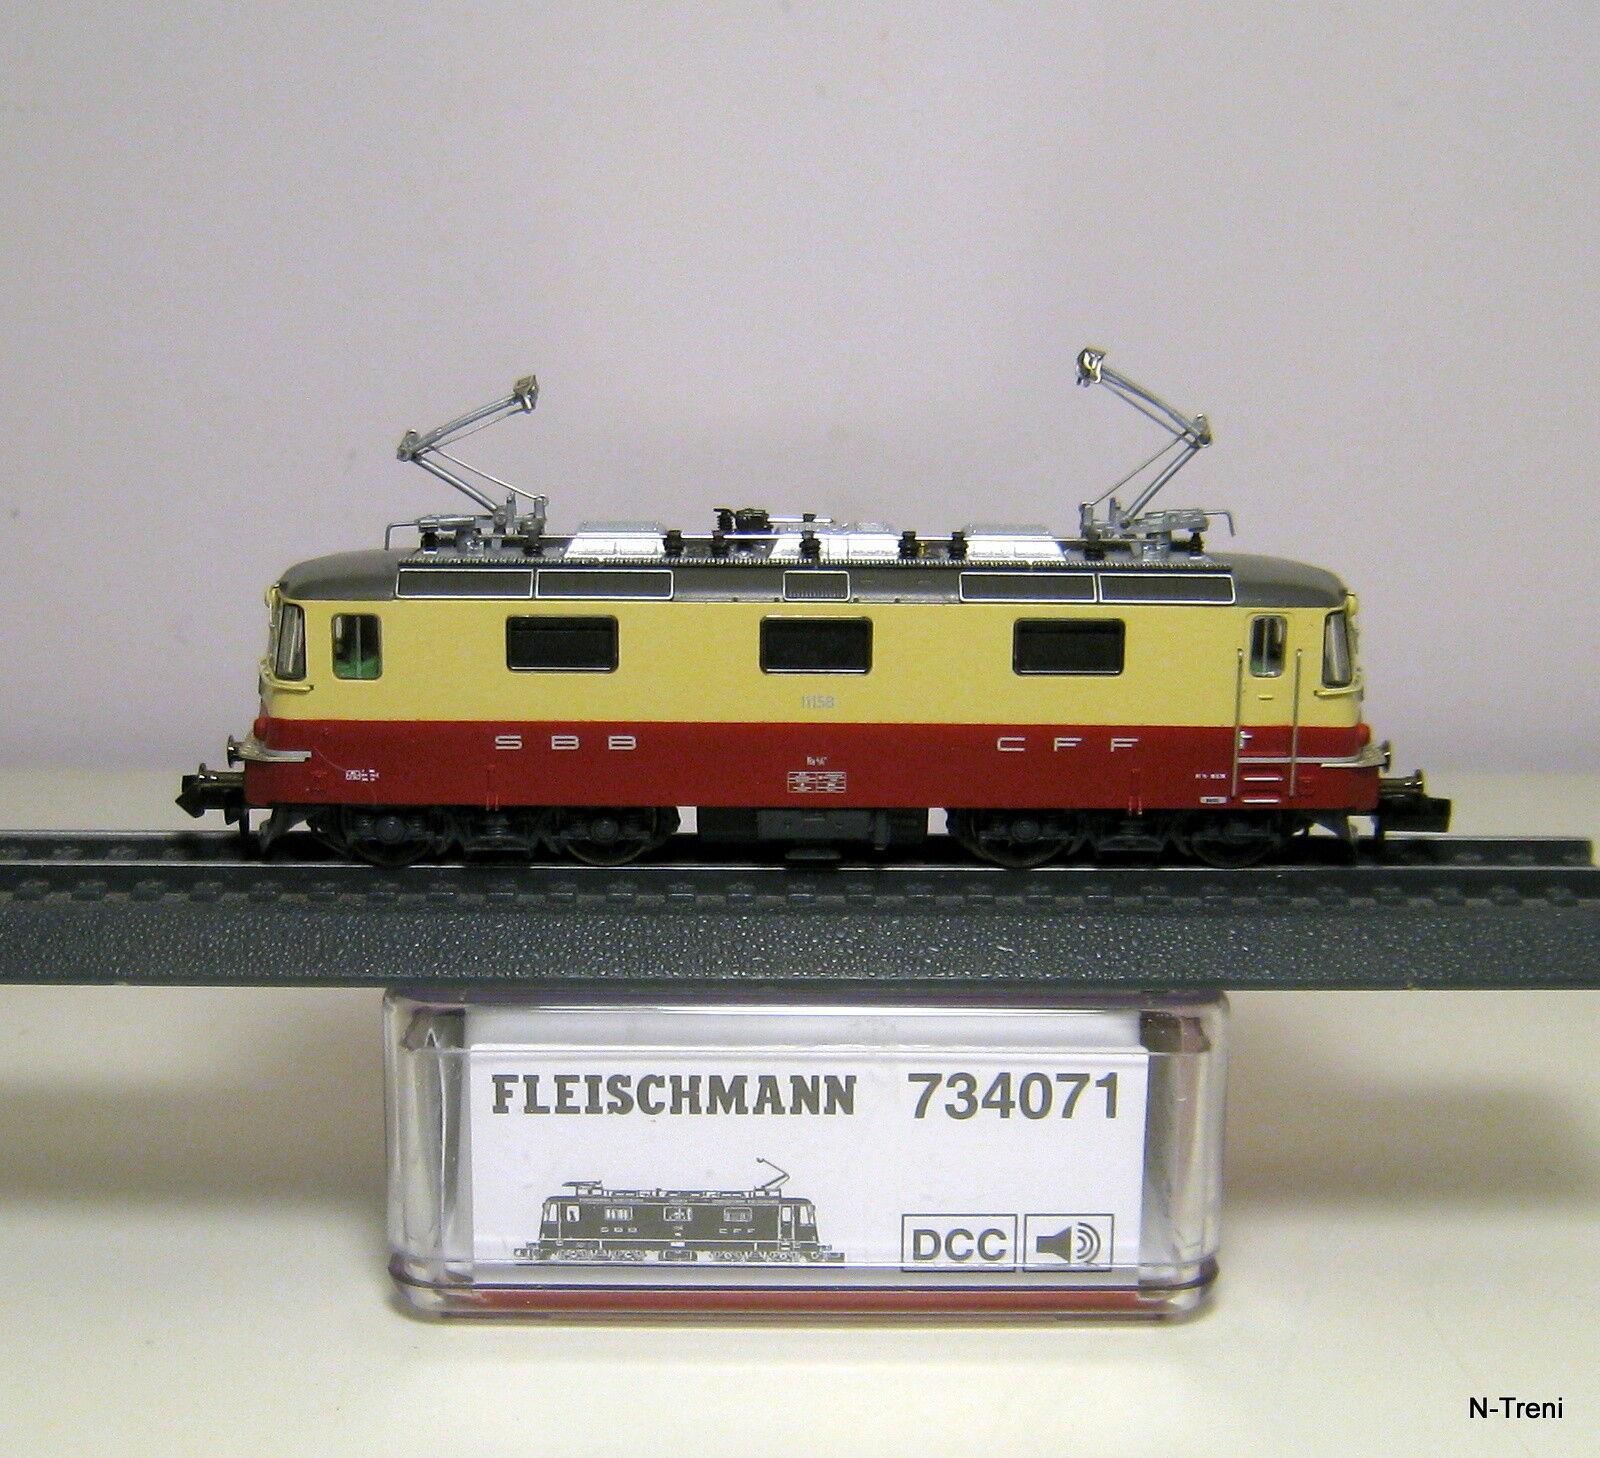 Fleischuomon N 734071 DCC  suono  Loco Re 44 II delle SBB. Livrea TEE